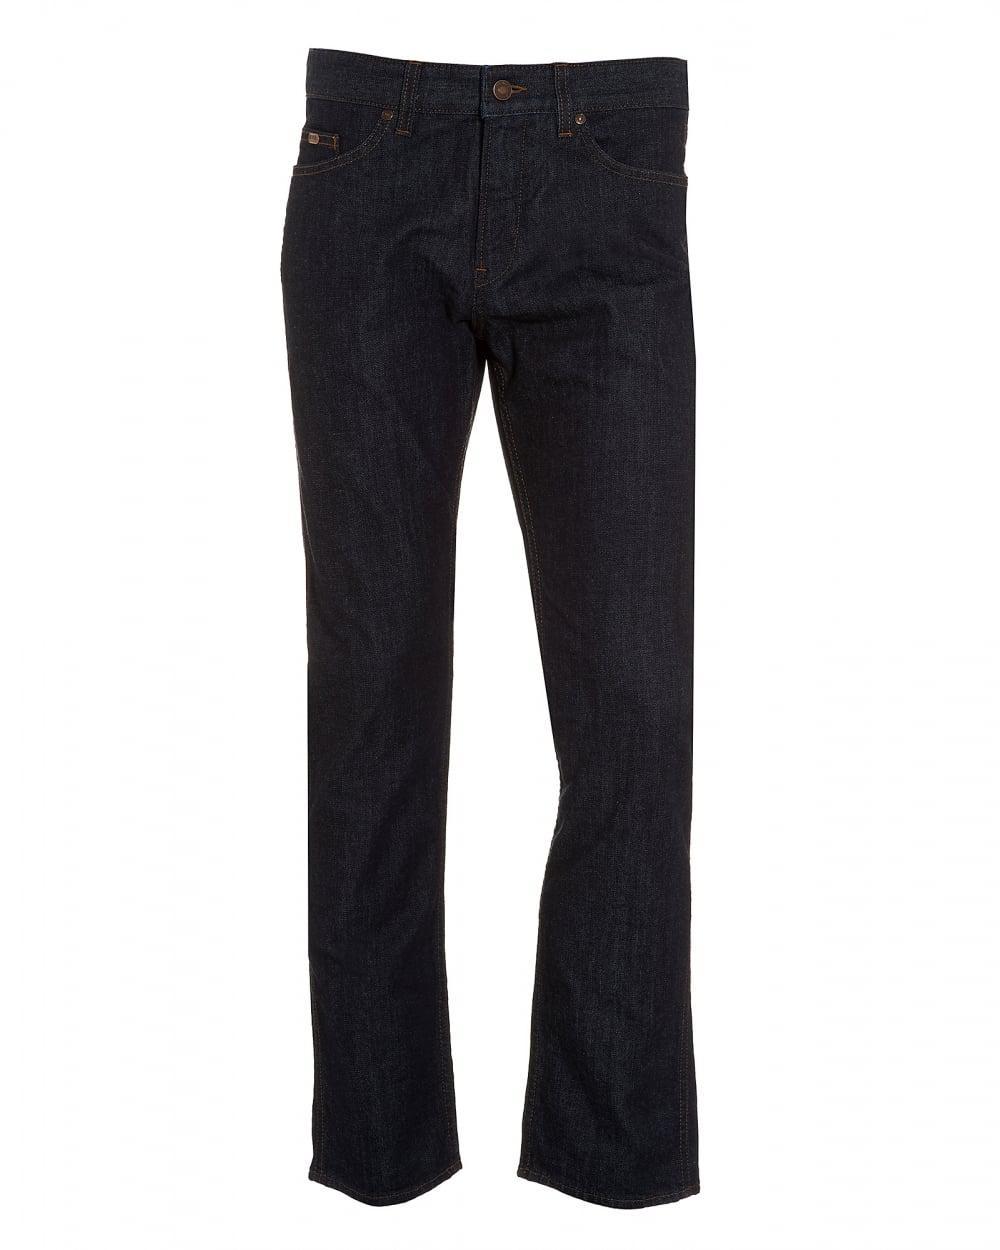 38d0171fc BOSS C-delaware1 Jean, Slim Fit Dark Indigo Jeans in Blue for Men - Lyst